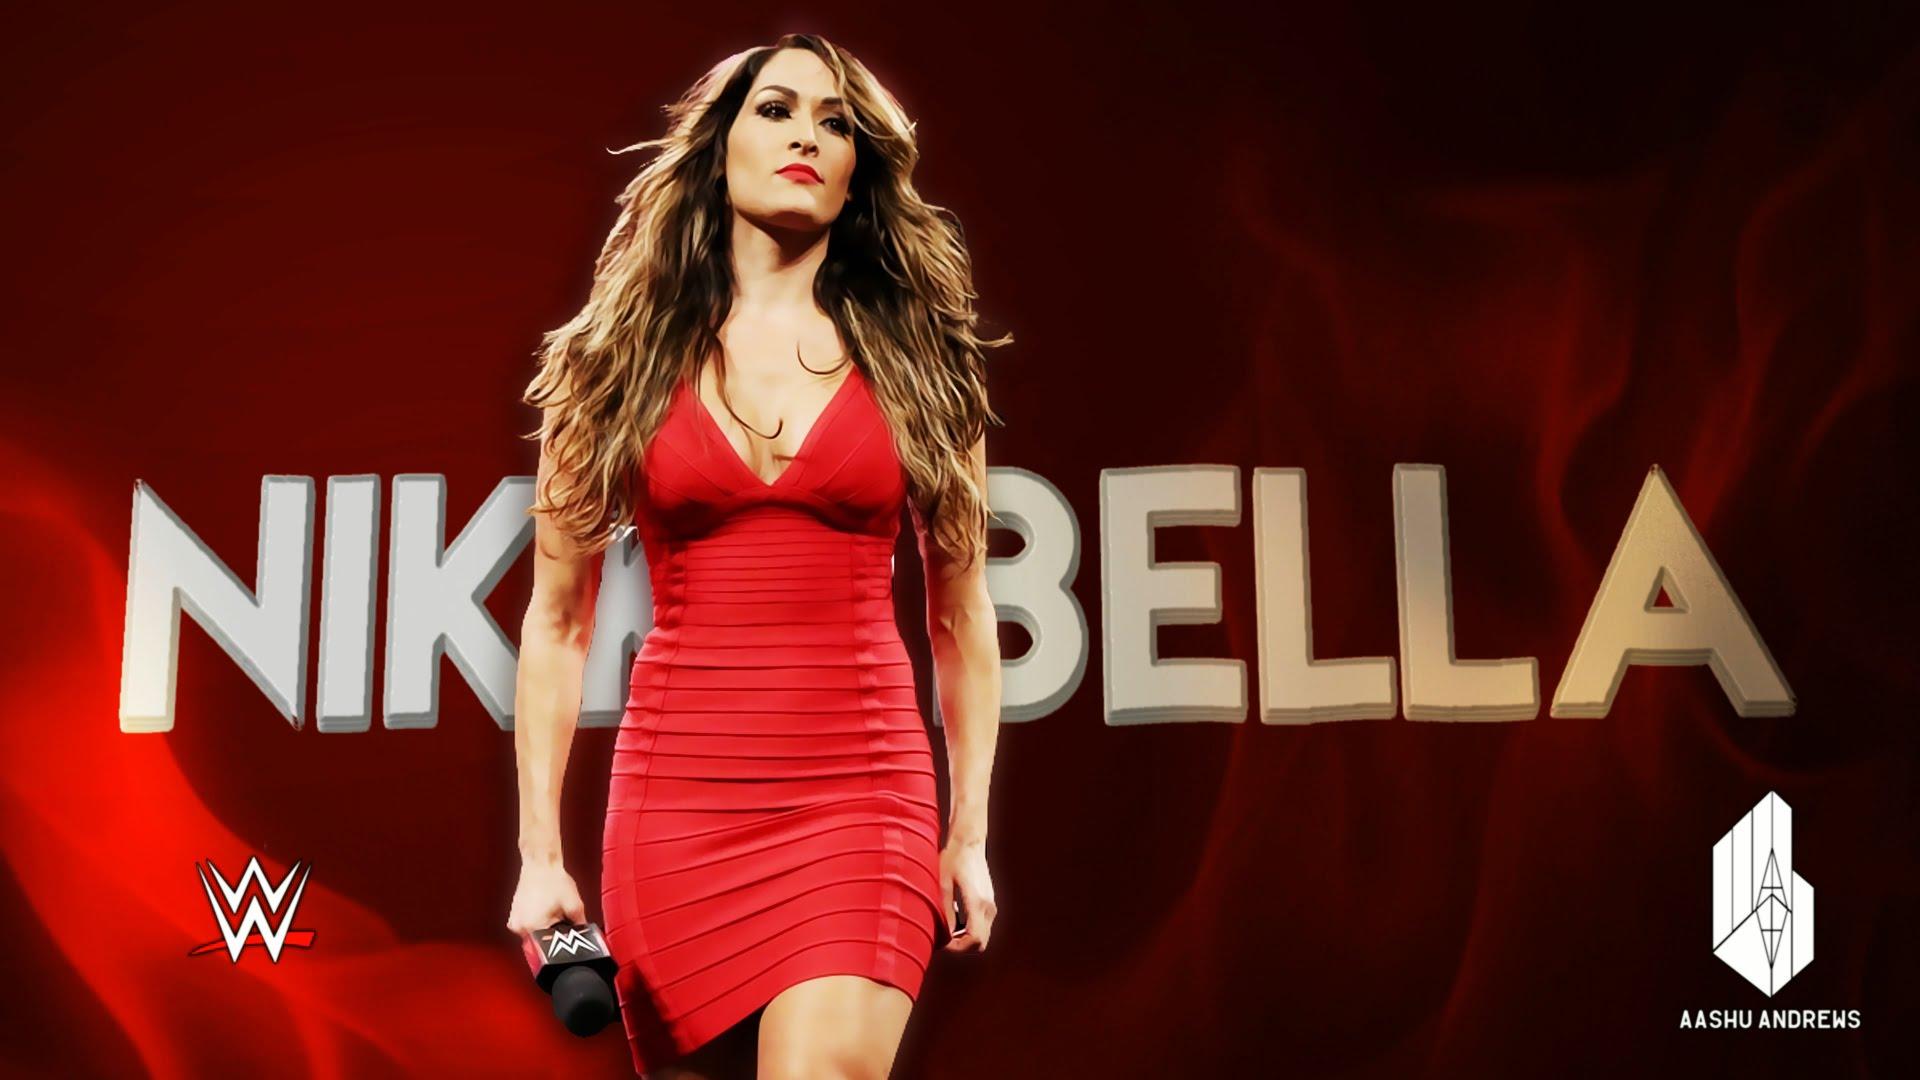 Wwe Nikki Bella Wallpaper Wwe Nikki Bella Heel 1146373